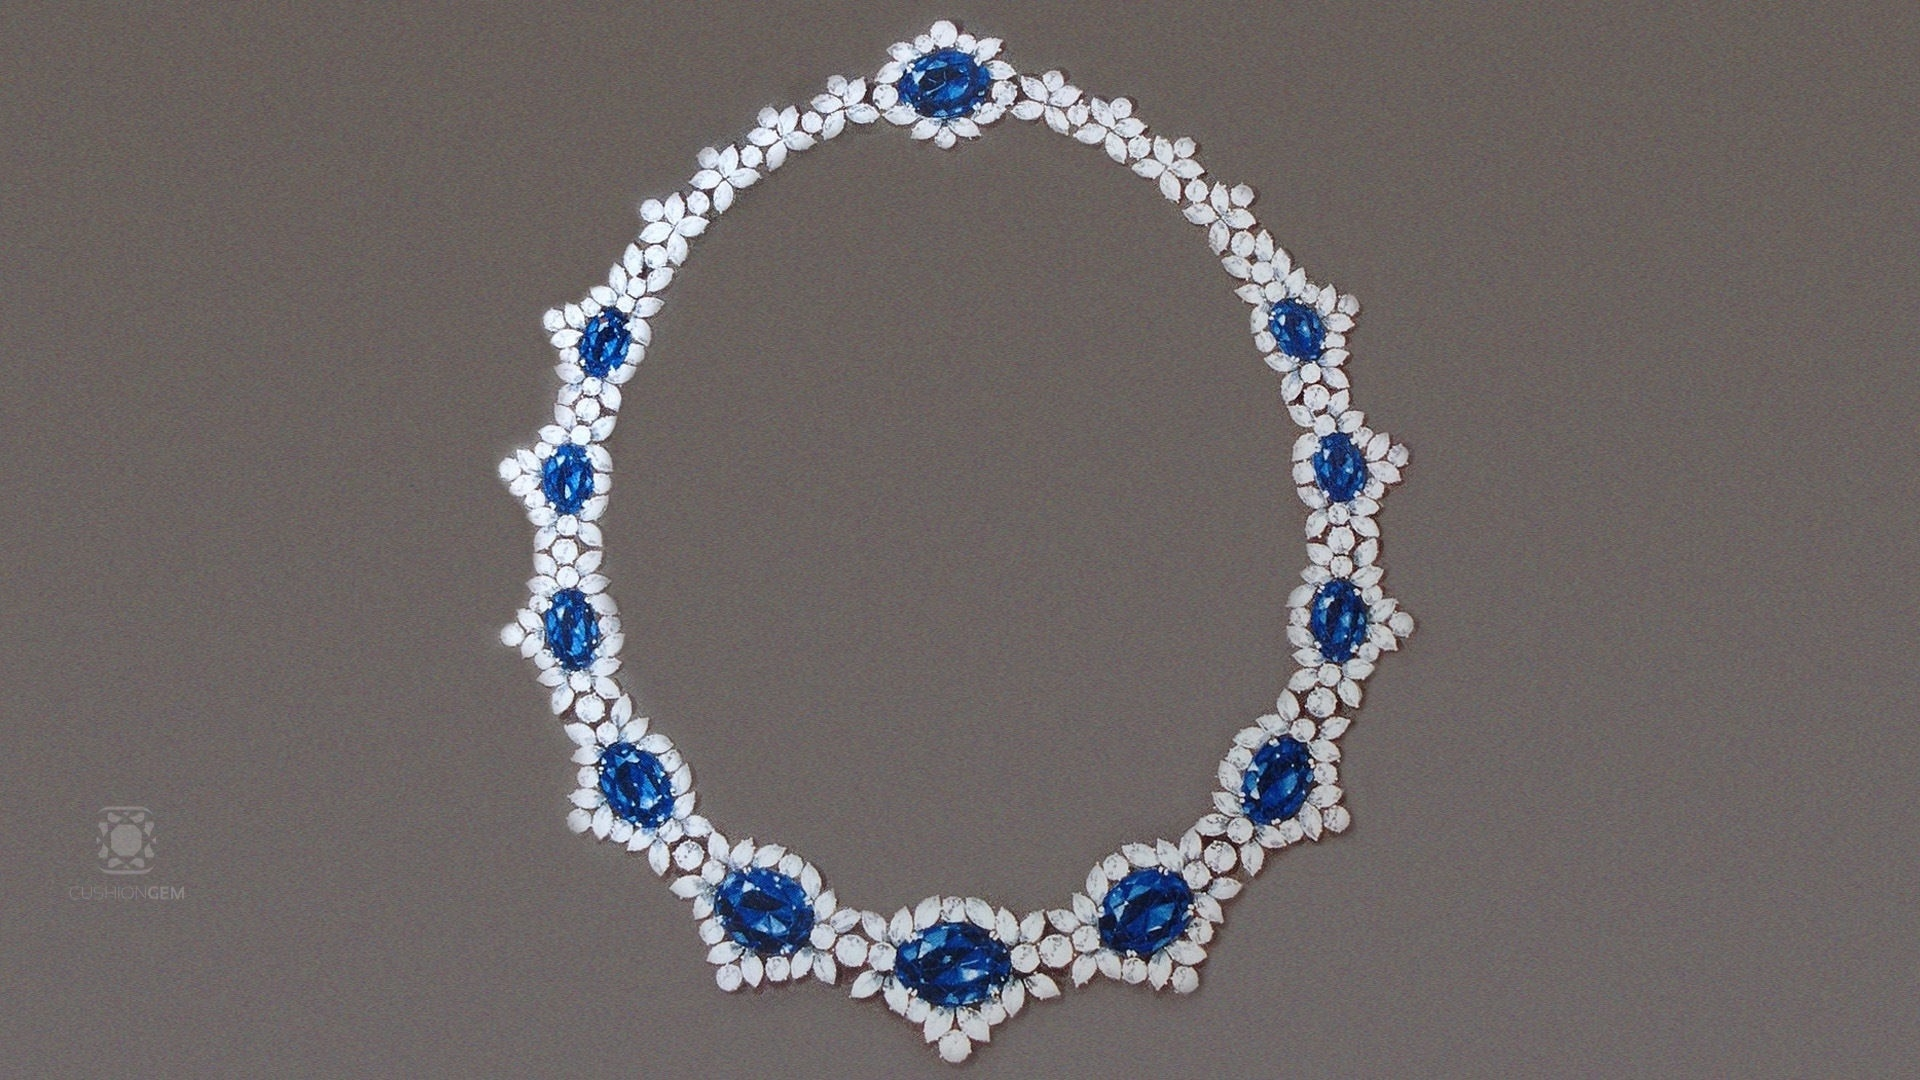 See the video on an important necklace built by Reginald C. Miller himself. - Narration: Benjamin Zucker, Author, Gem Trader